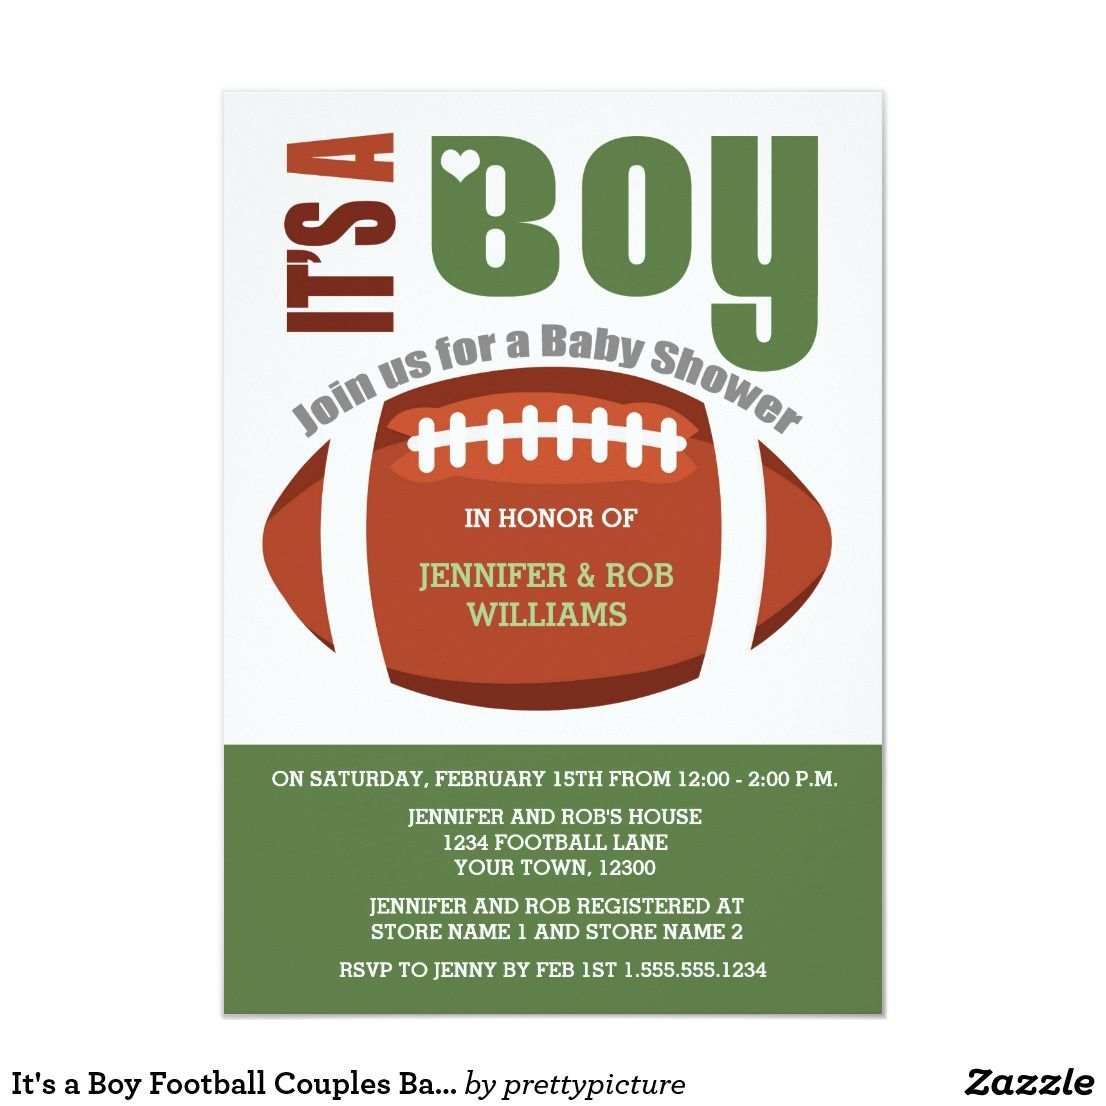 It's a Boy Football Couples Baby Shower Invitation | Zazzle.com